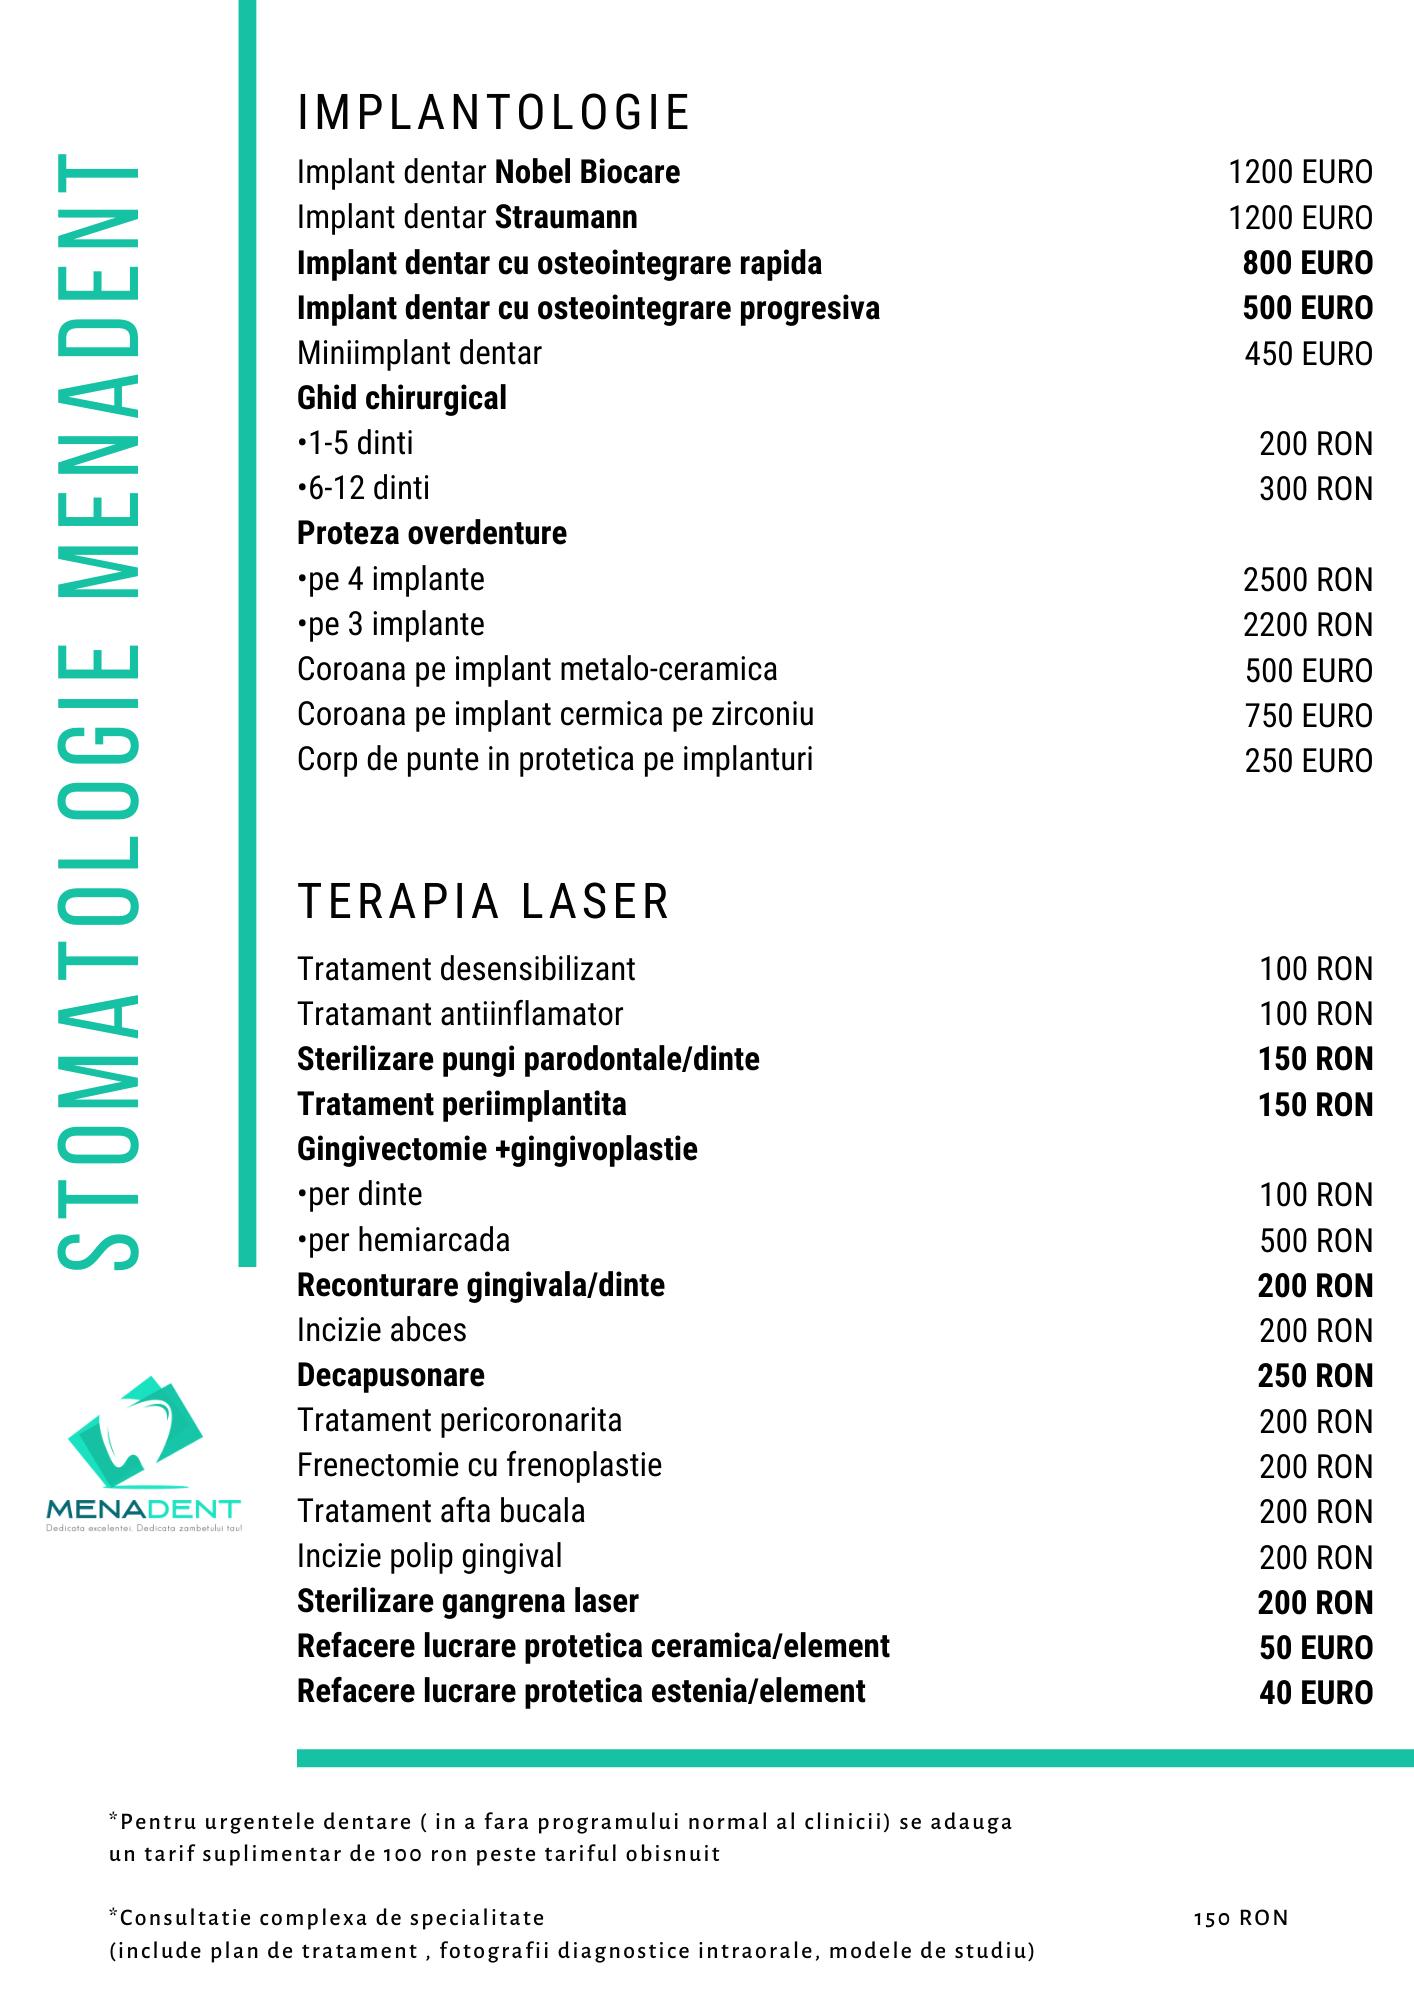 Copy of Implantologie